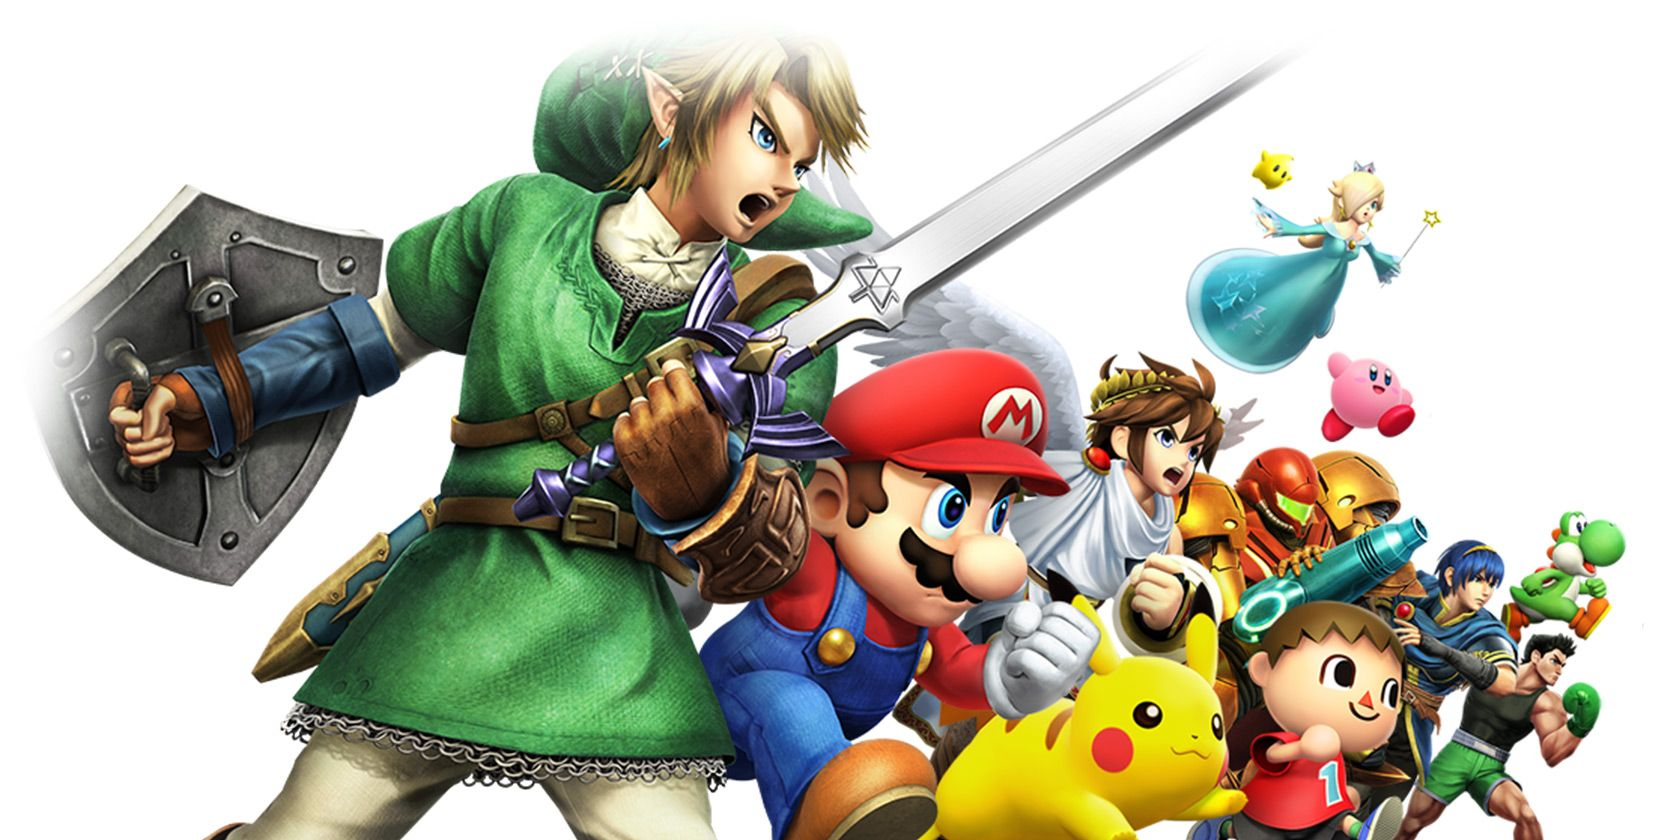 Super Smash Bros. Brawl Poster 13x19   Etsy